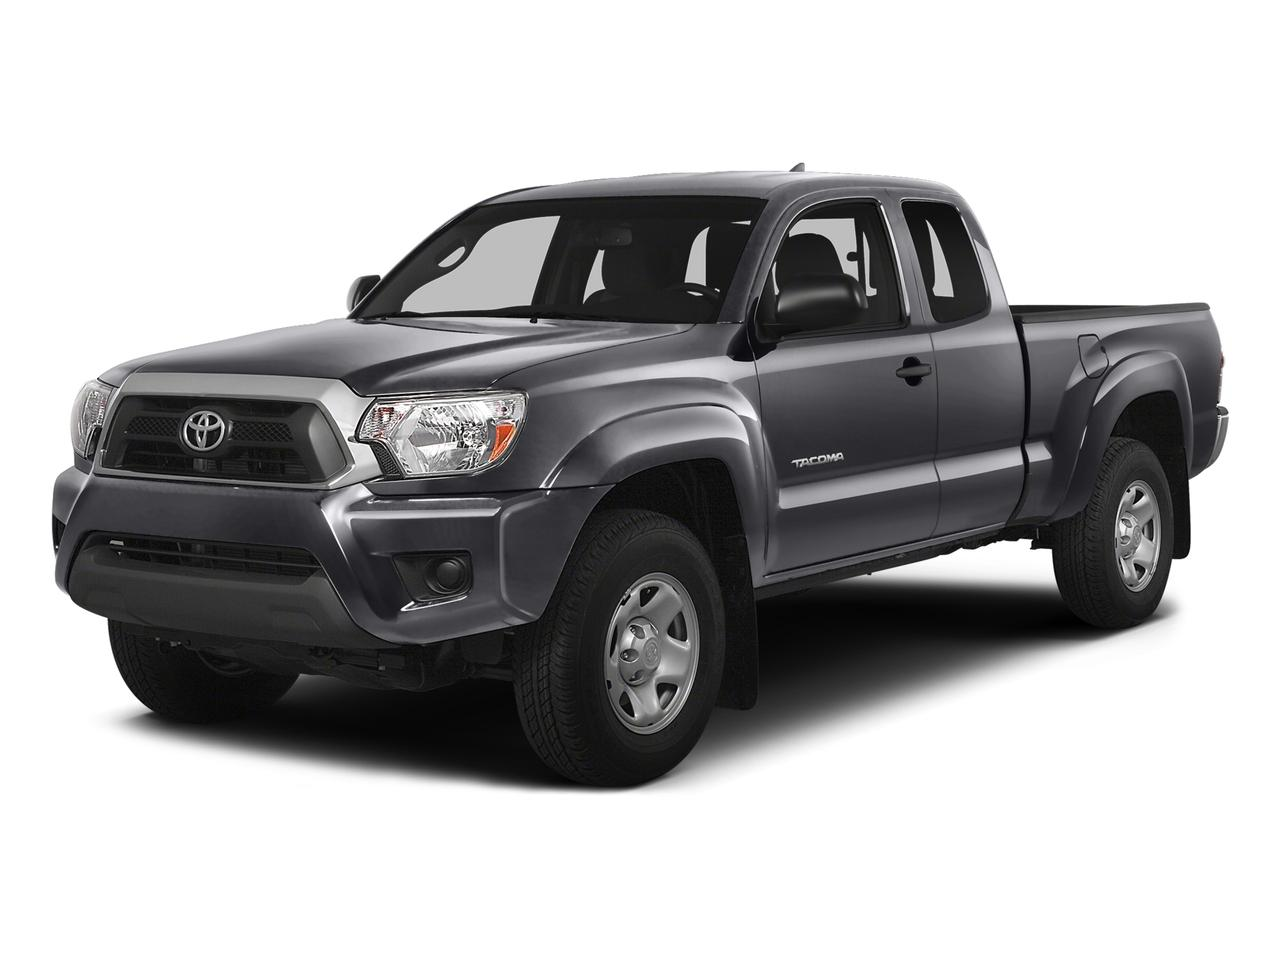 2015 Toyota Tacoma Vehicle Photo in Baton Rouge, LA 70809